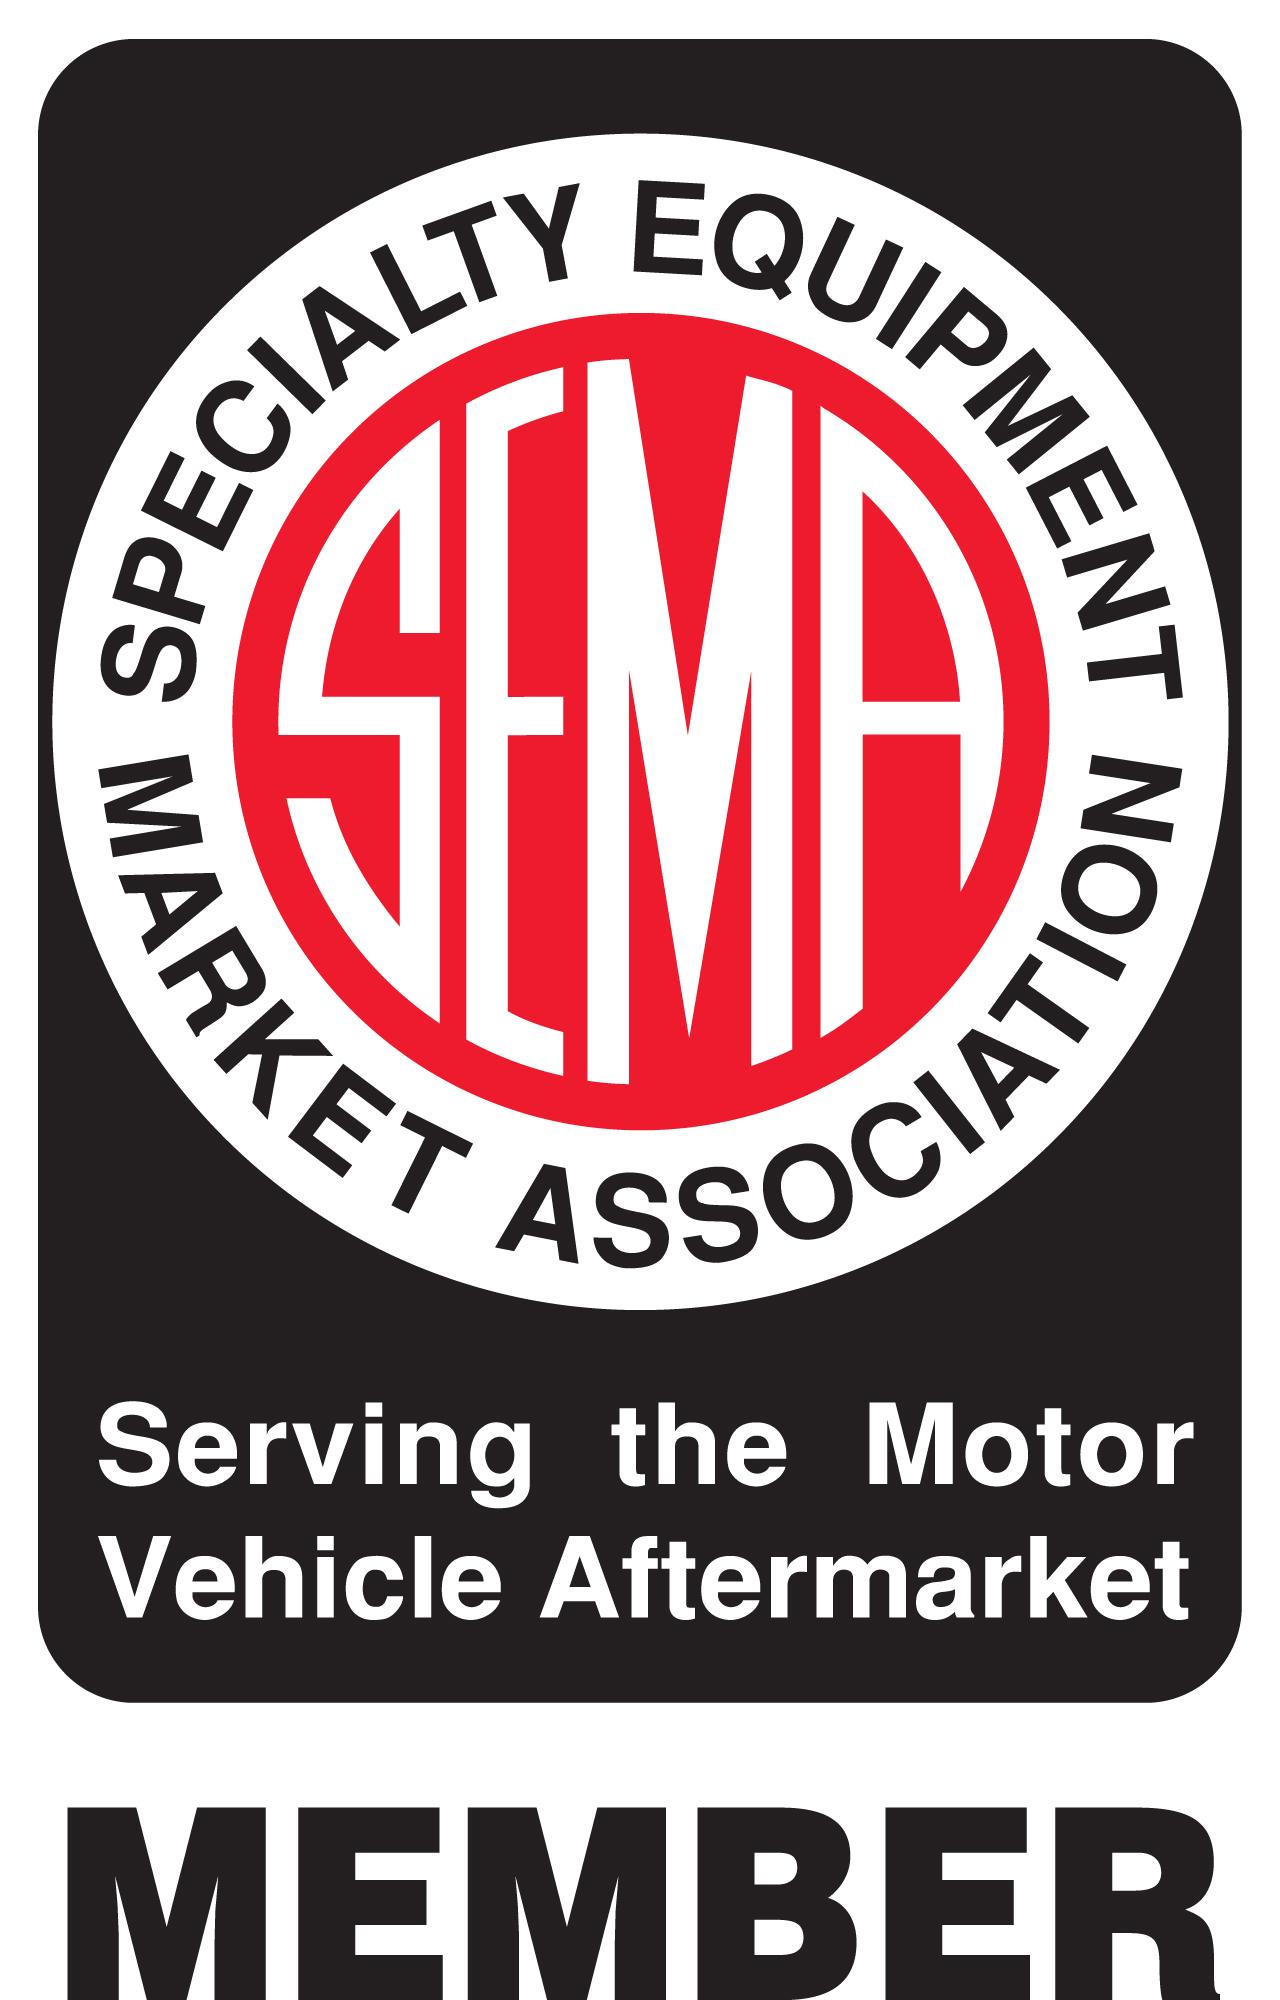 Current SEMA Member